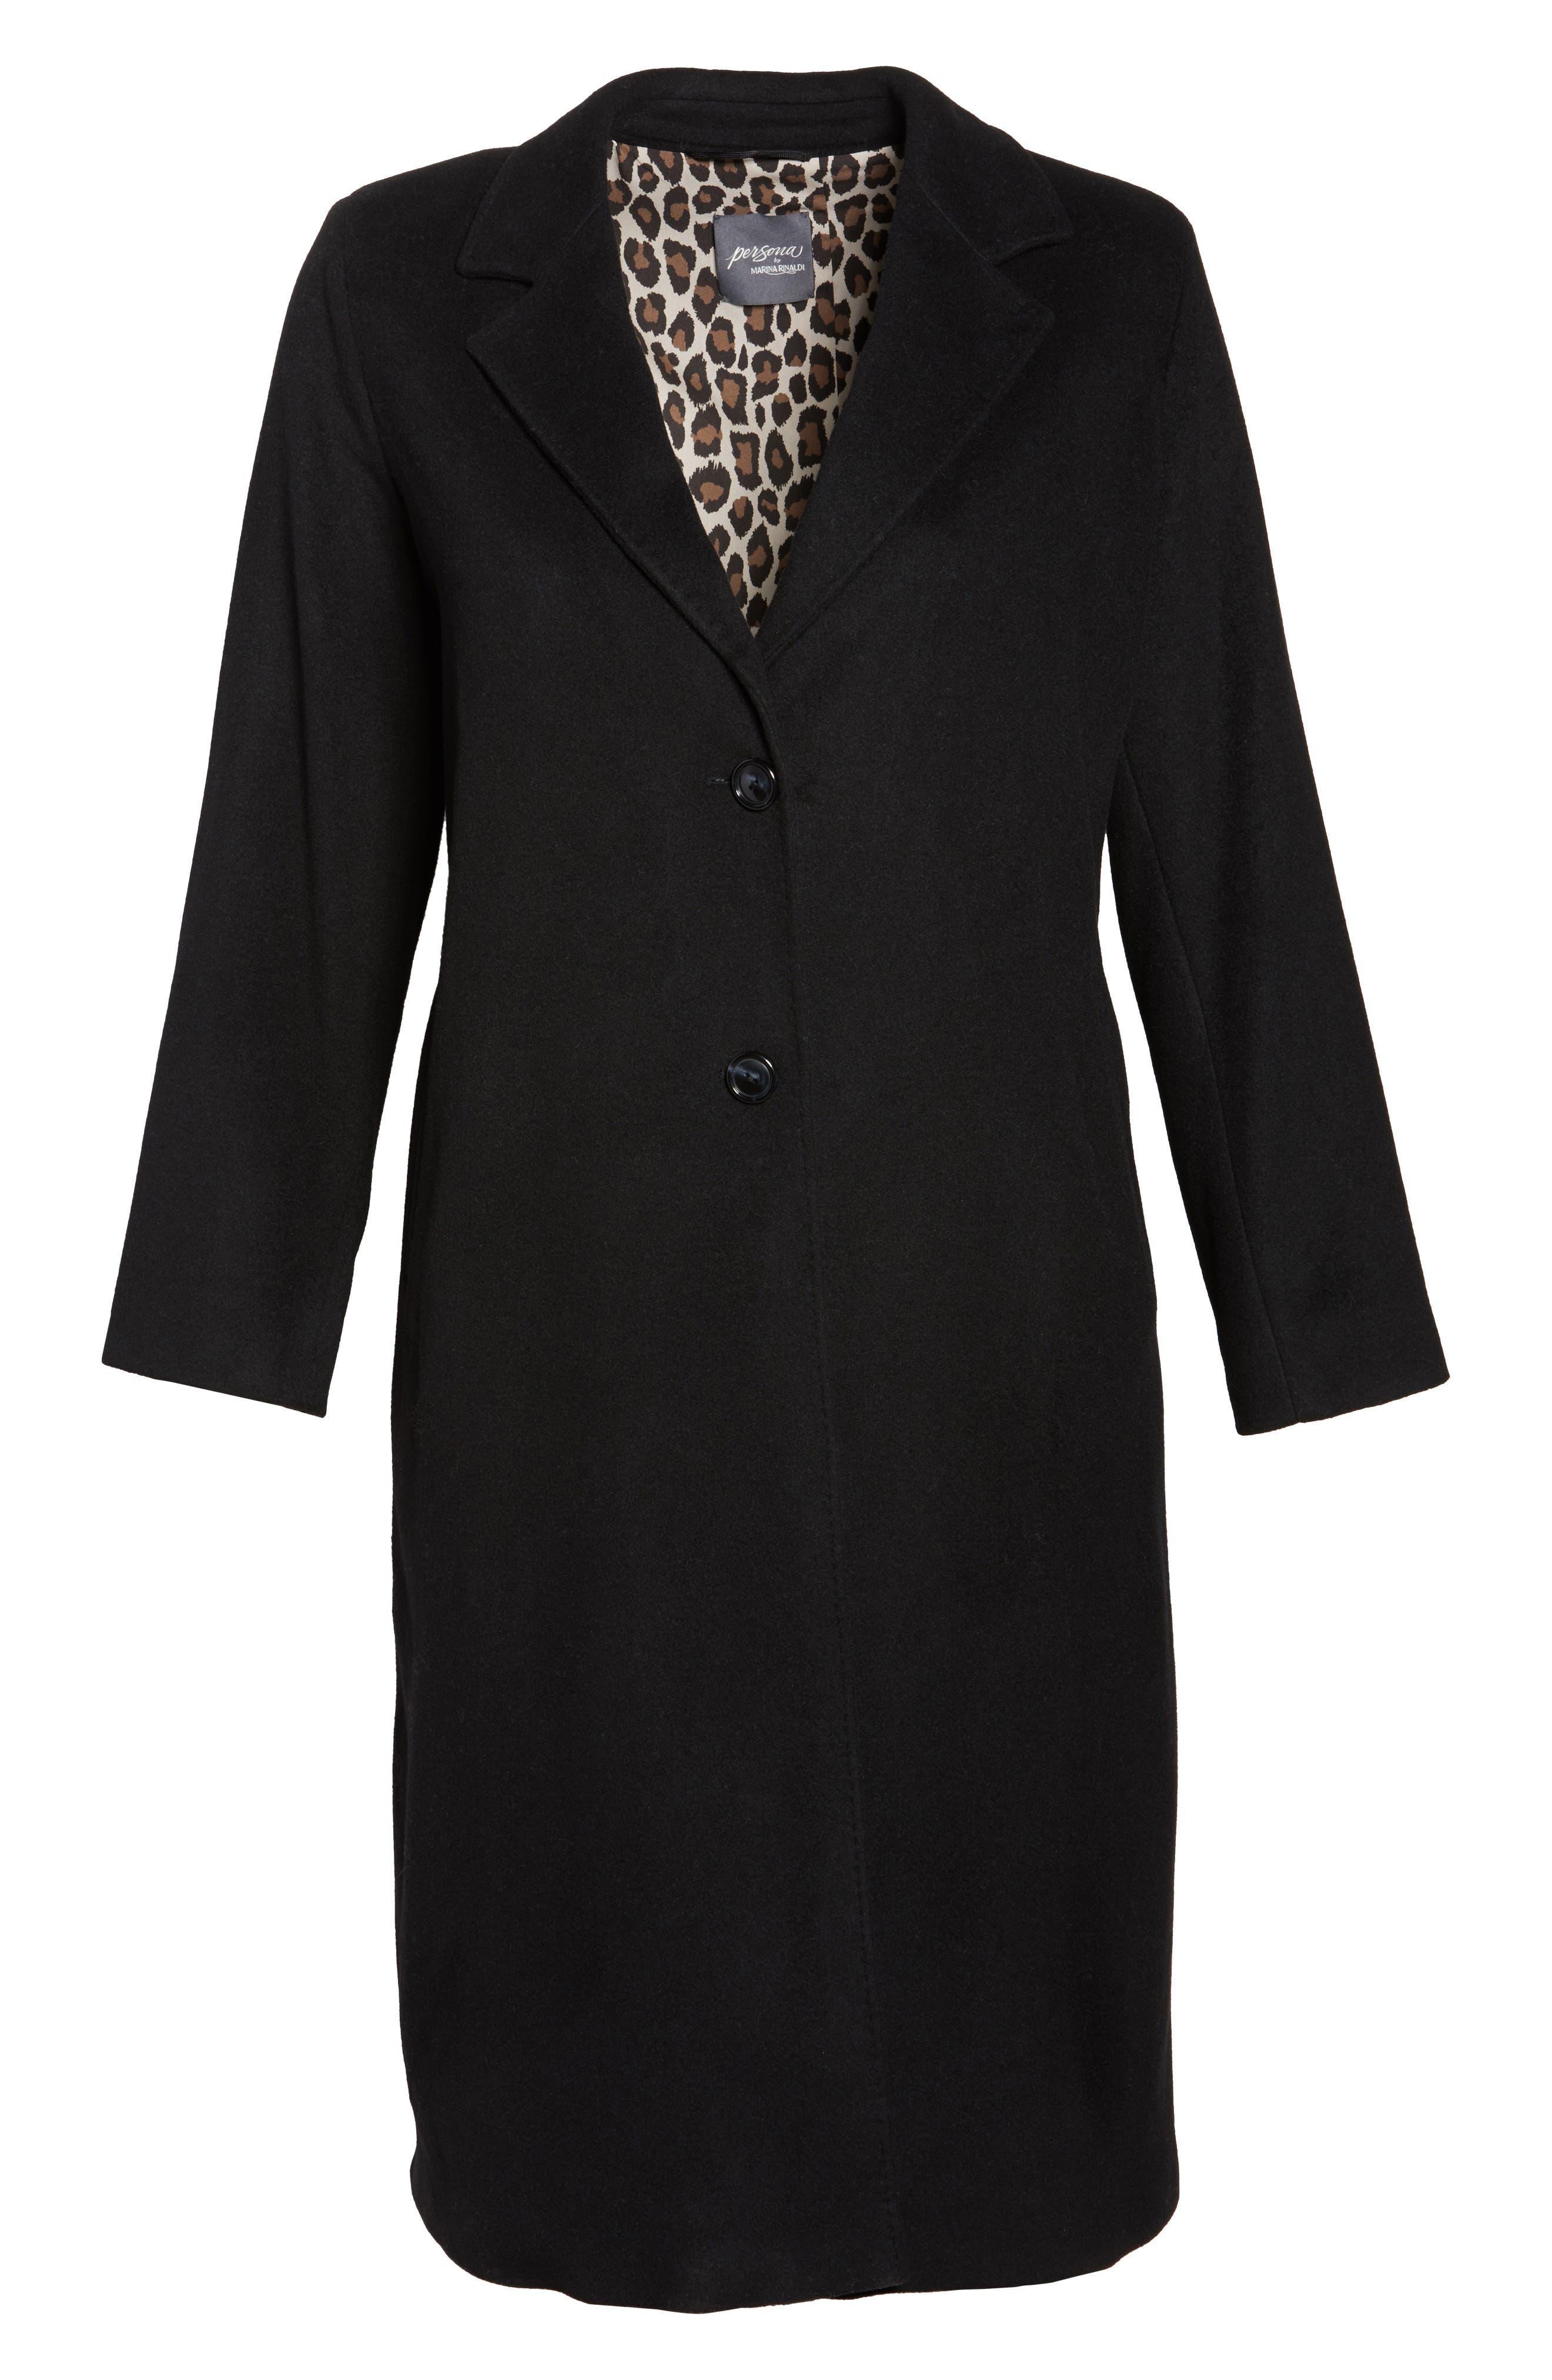 Tamigi Coat,                             Alternate thumbnail 5, color,                             Black